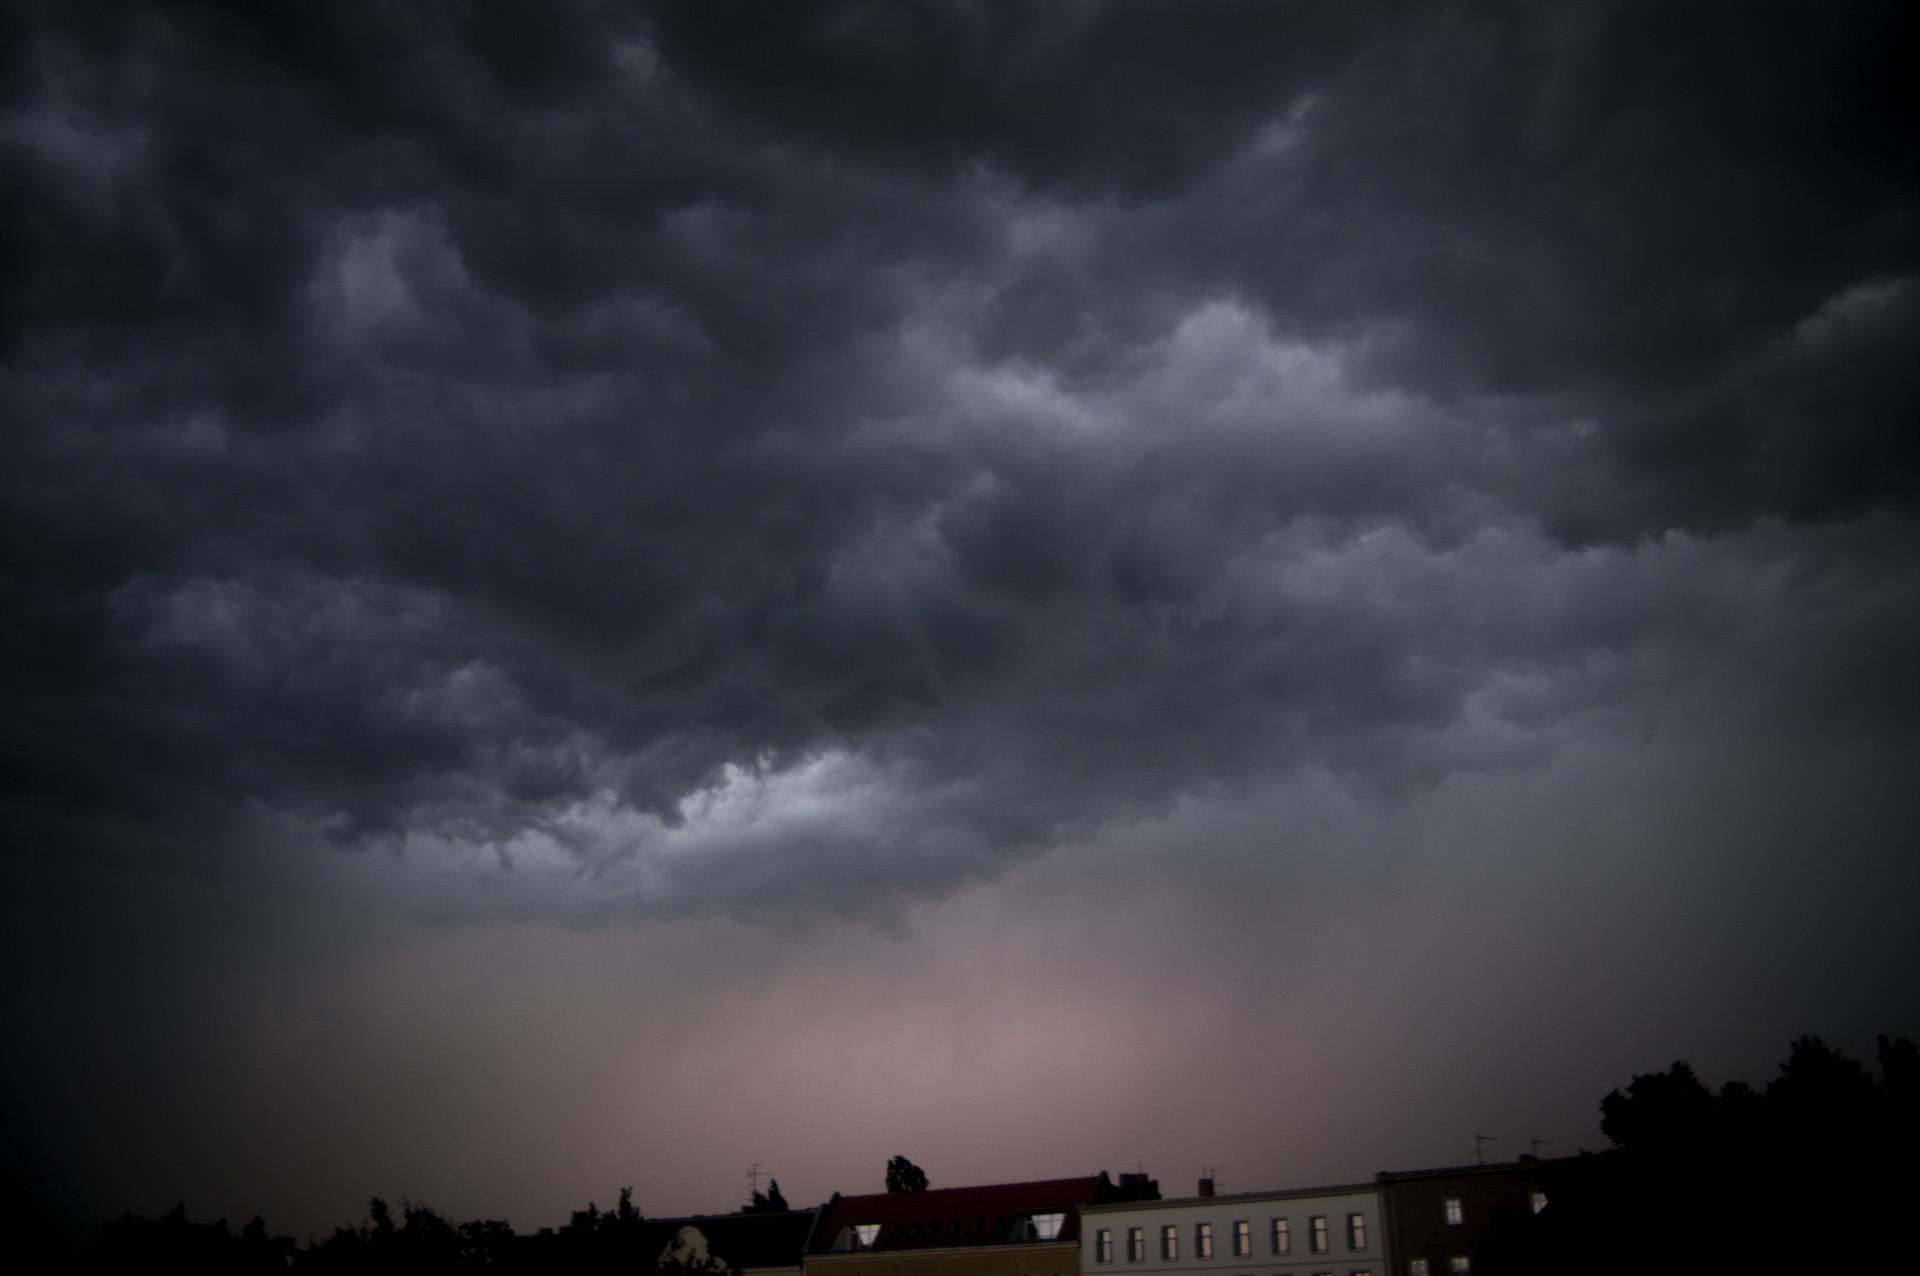 Berlin_Wolken_Gewitter_Carolin-Weinkopf_IGP4765b